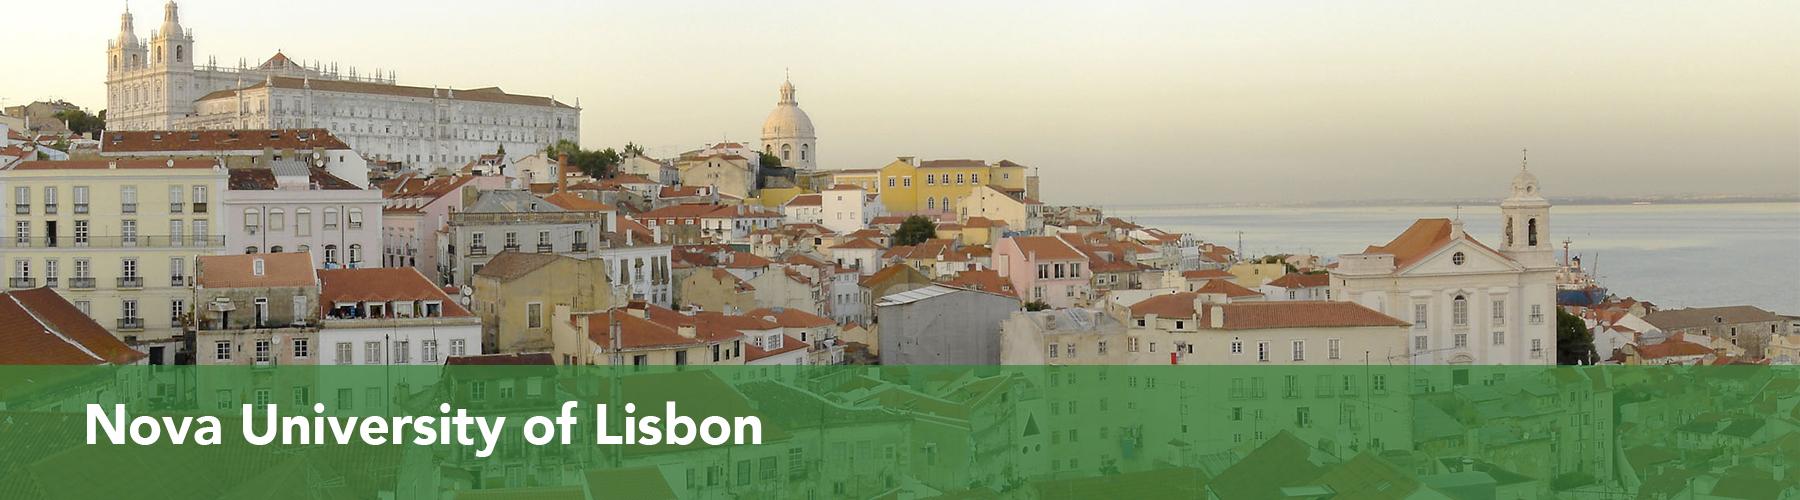 Alframbra district of Lisbon